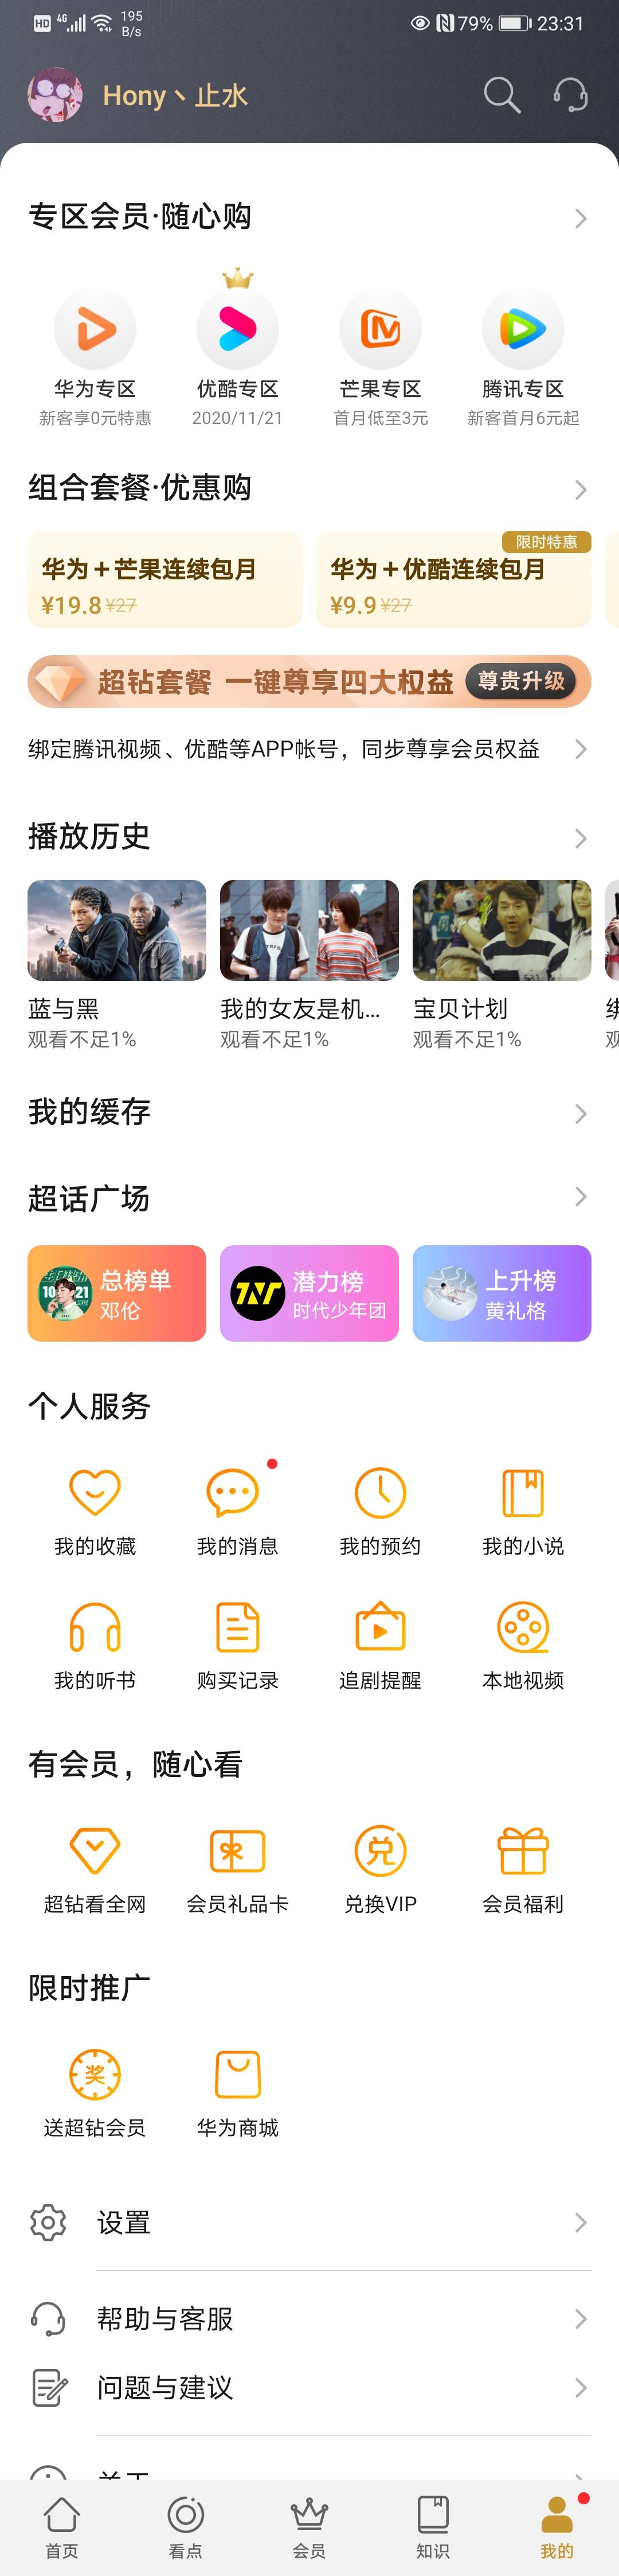 Screenshot_20201020_233158_com.huawei.himovie.jpg